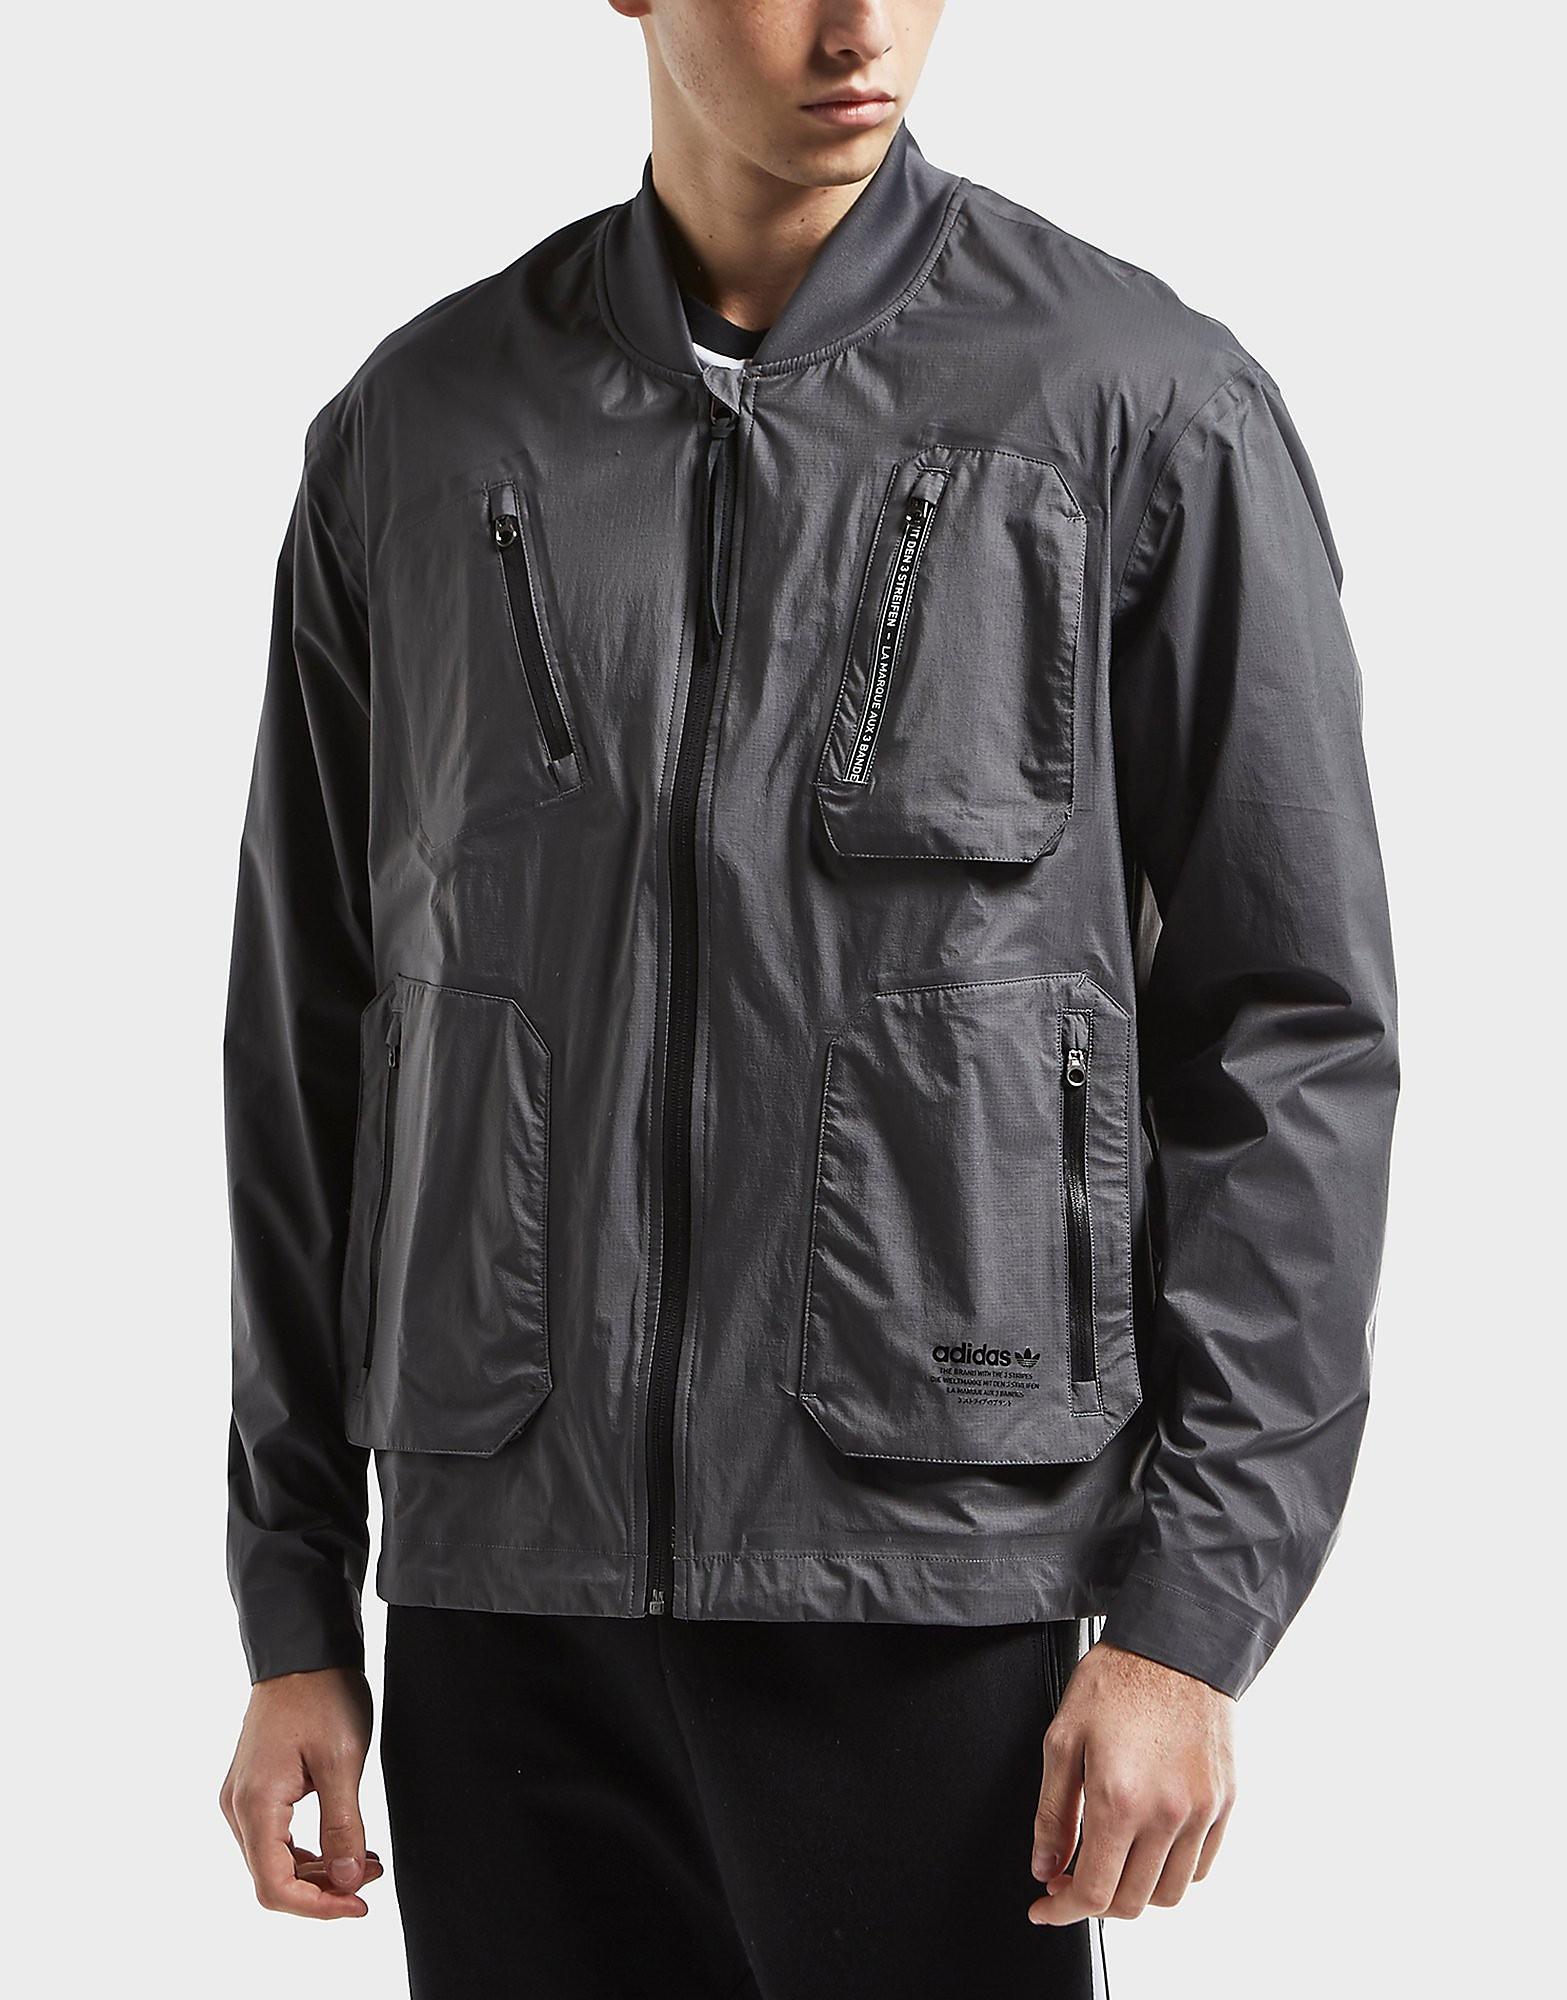 adidas Originals NMD Bomber Jacket